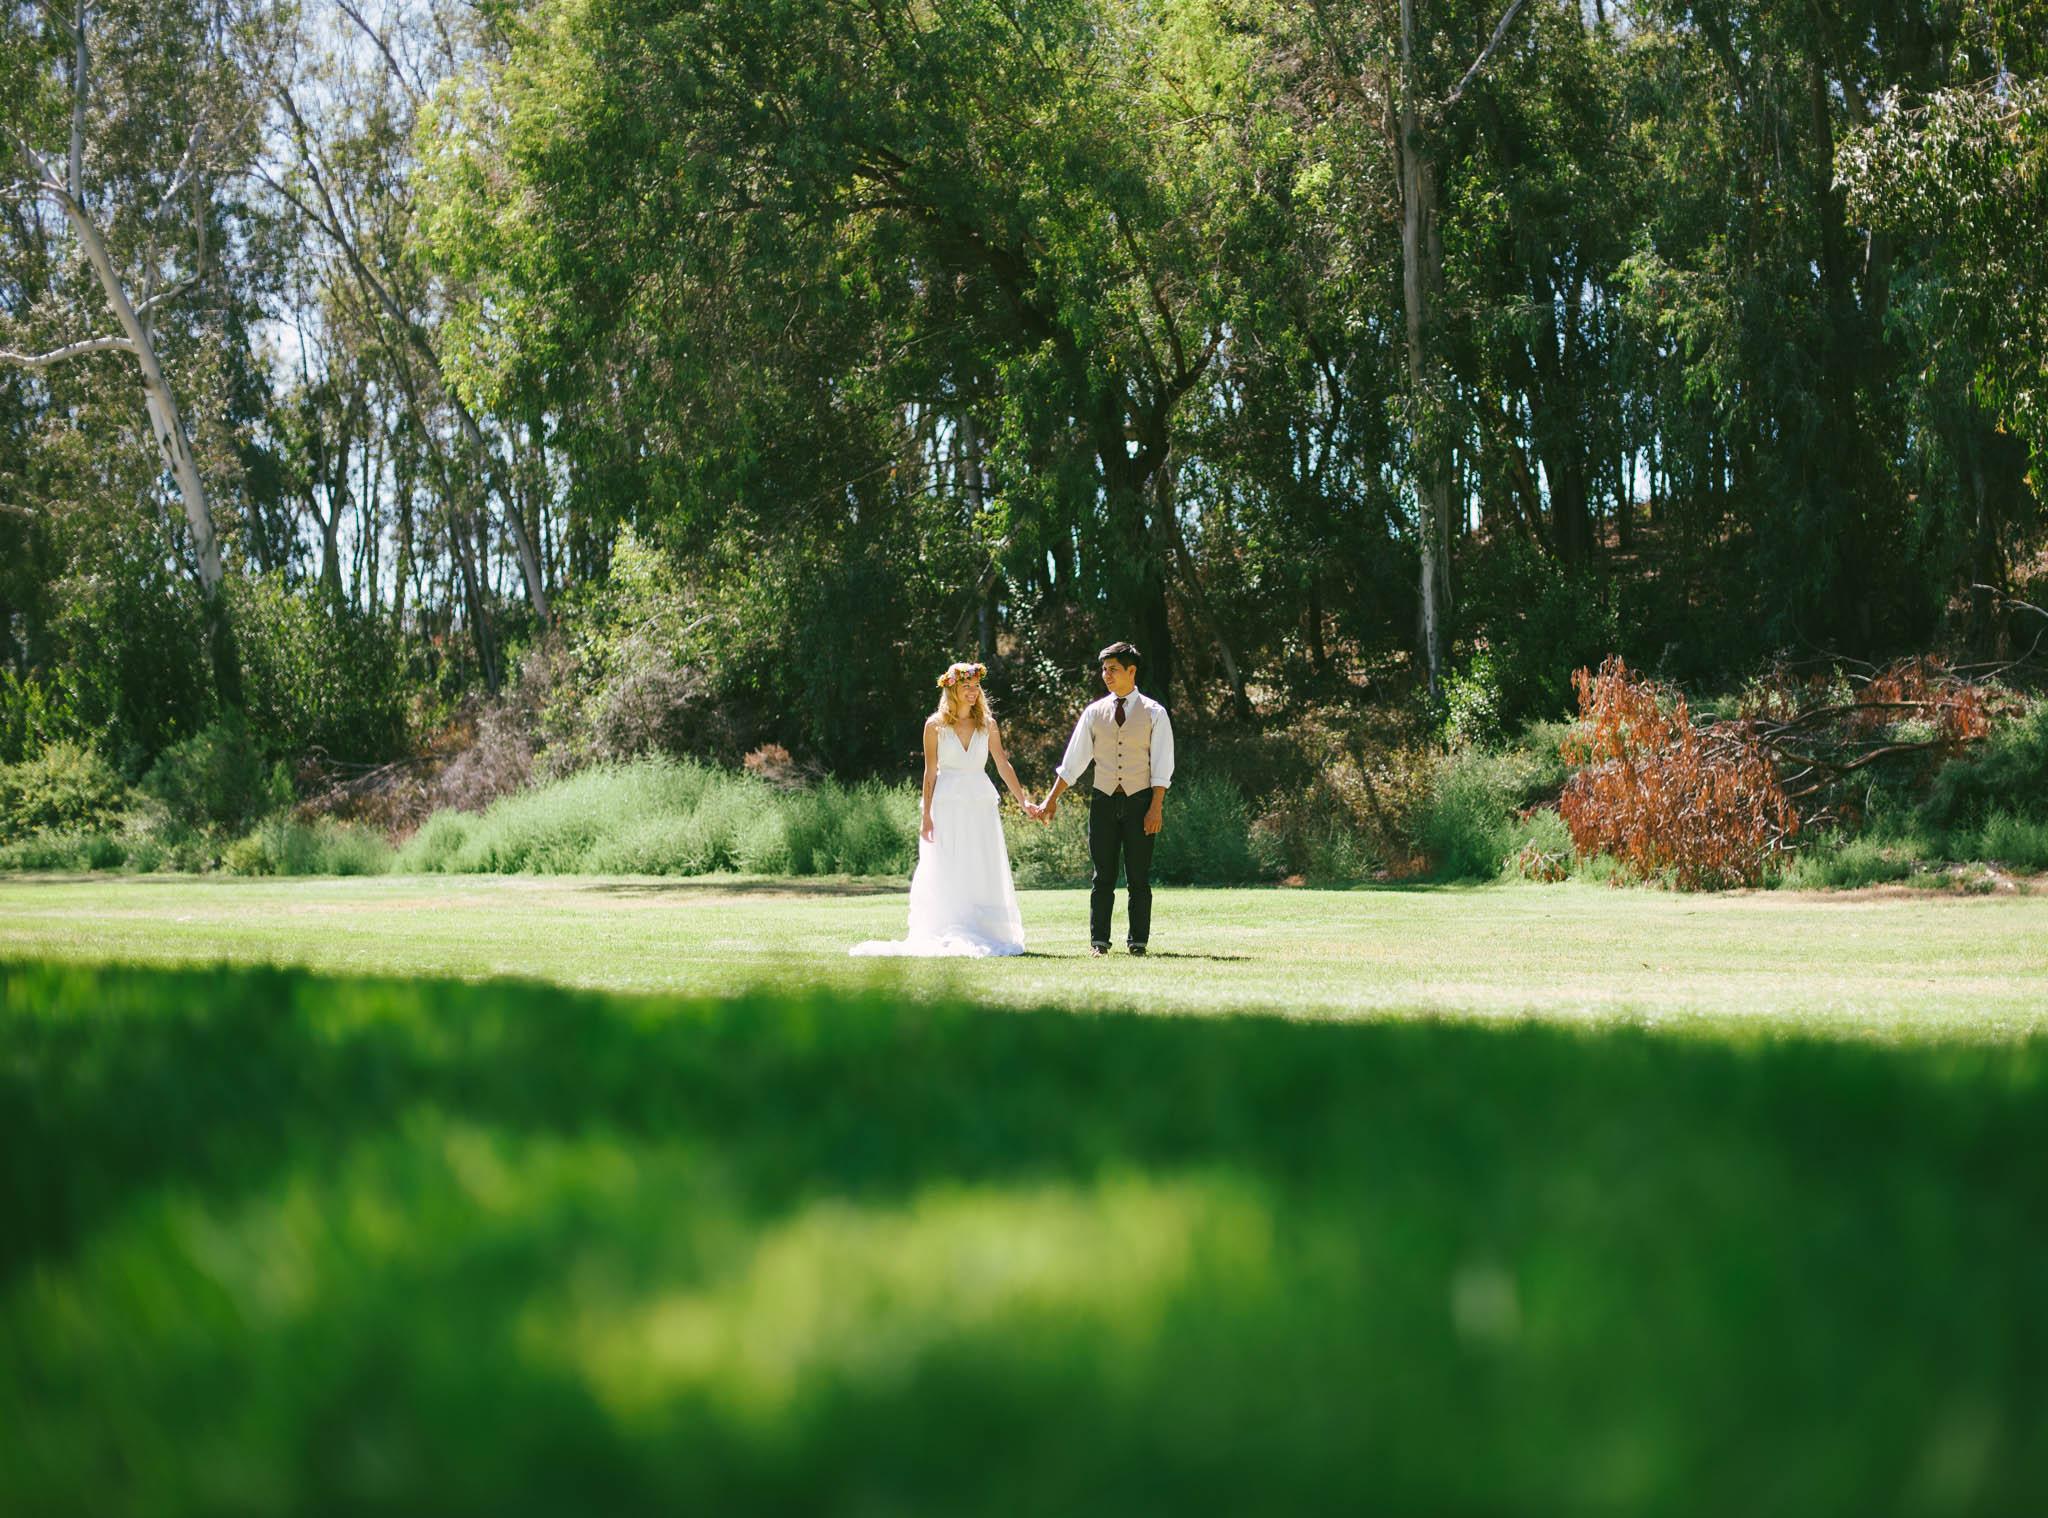 ©Isaiah & Taylor Photography - Los Angeles Wedding Photographer - Mexican Bohemian Wedding, Laguna Niguel Regional Park, Orange County-23.jpg